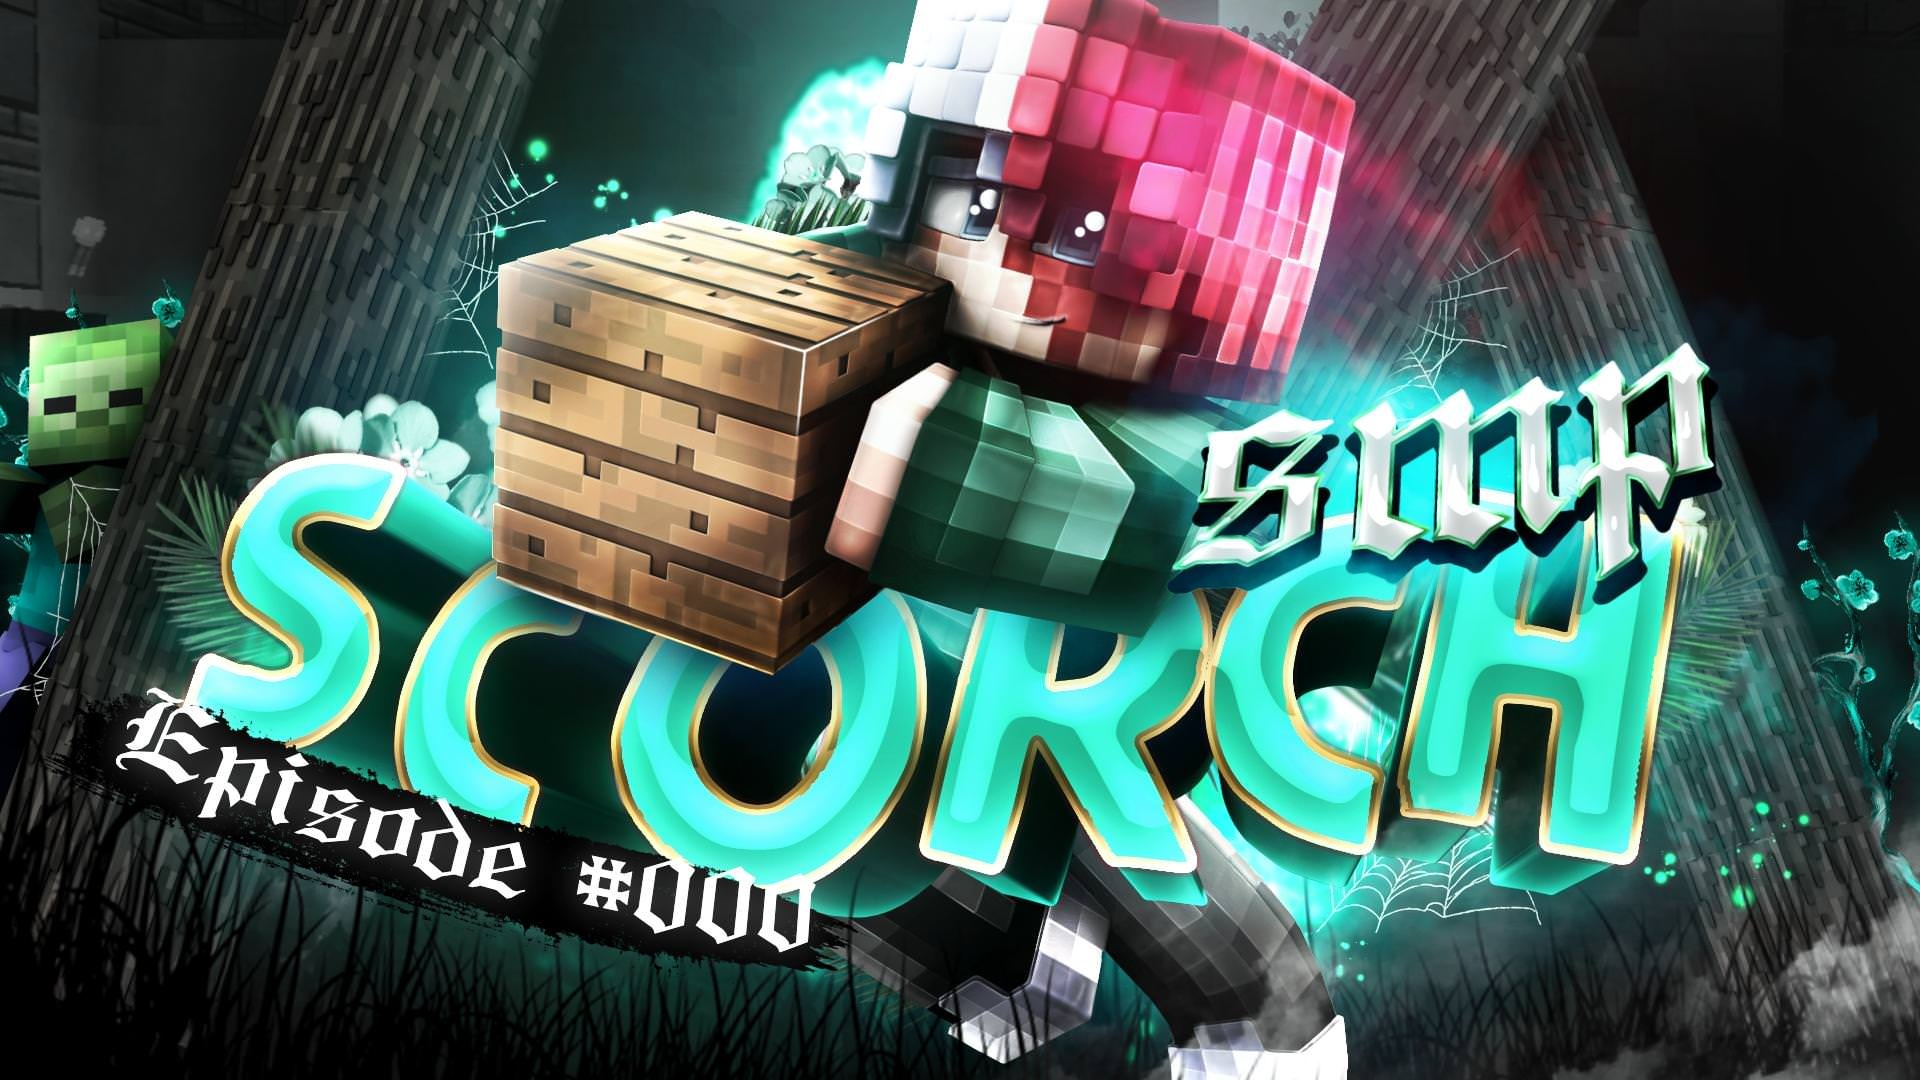 ☆Cheap Minecraft Thumbnail☆ [$4.50]